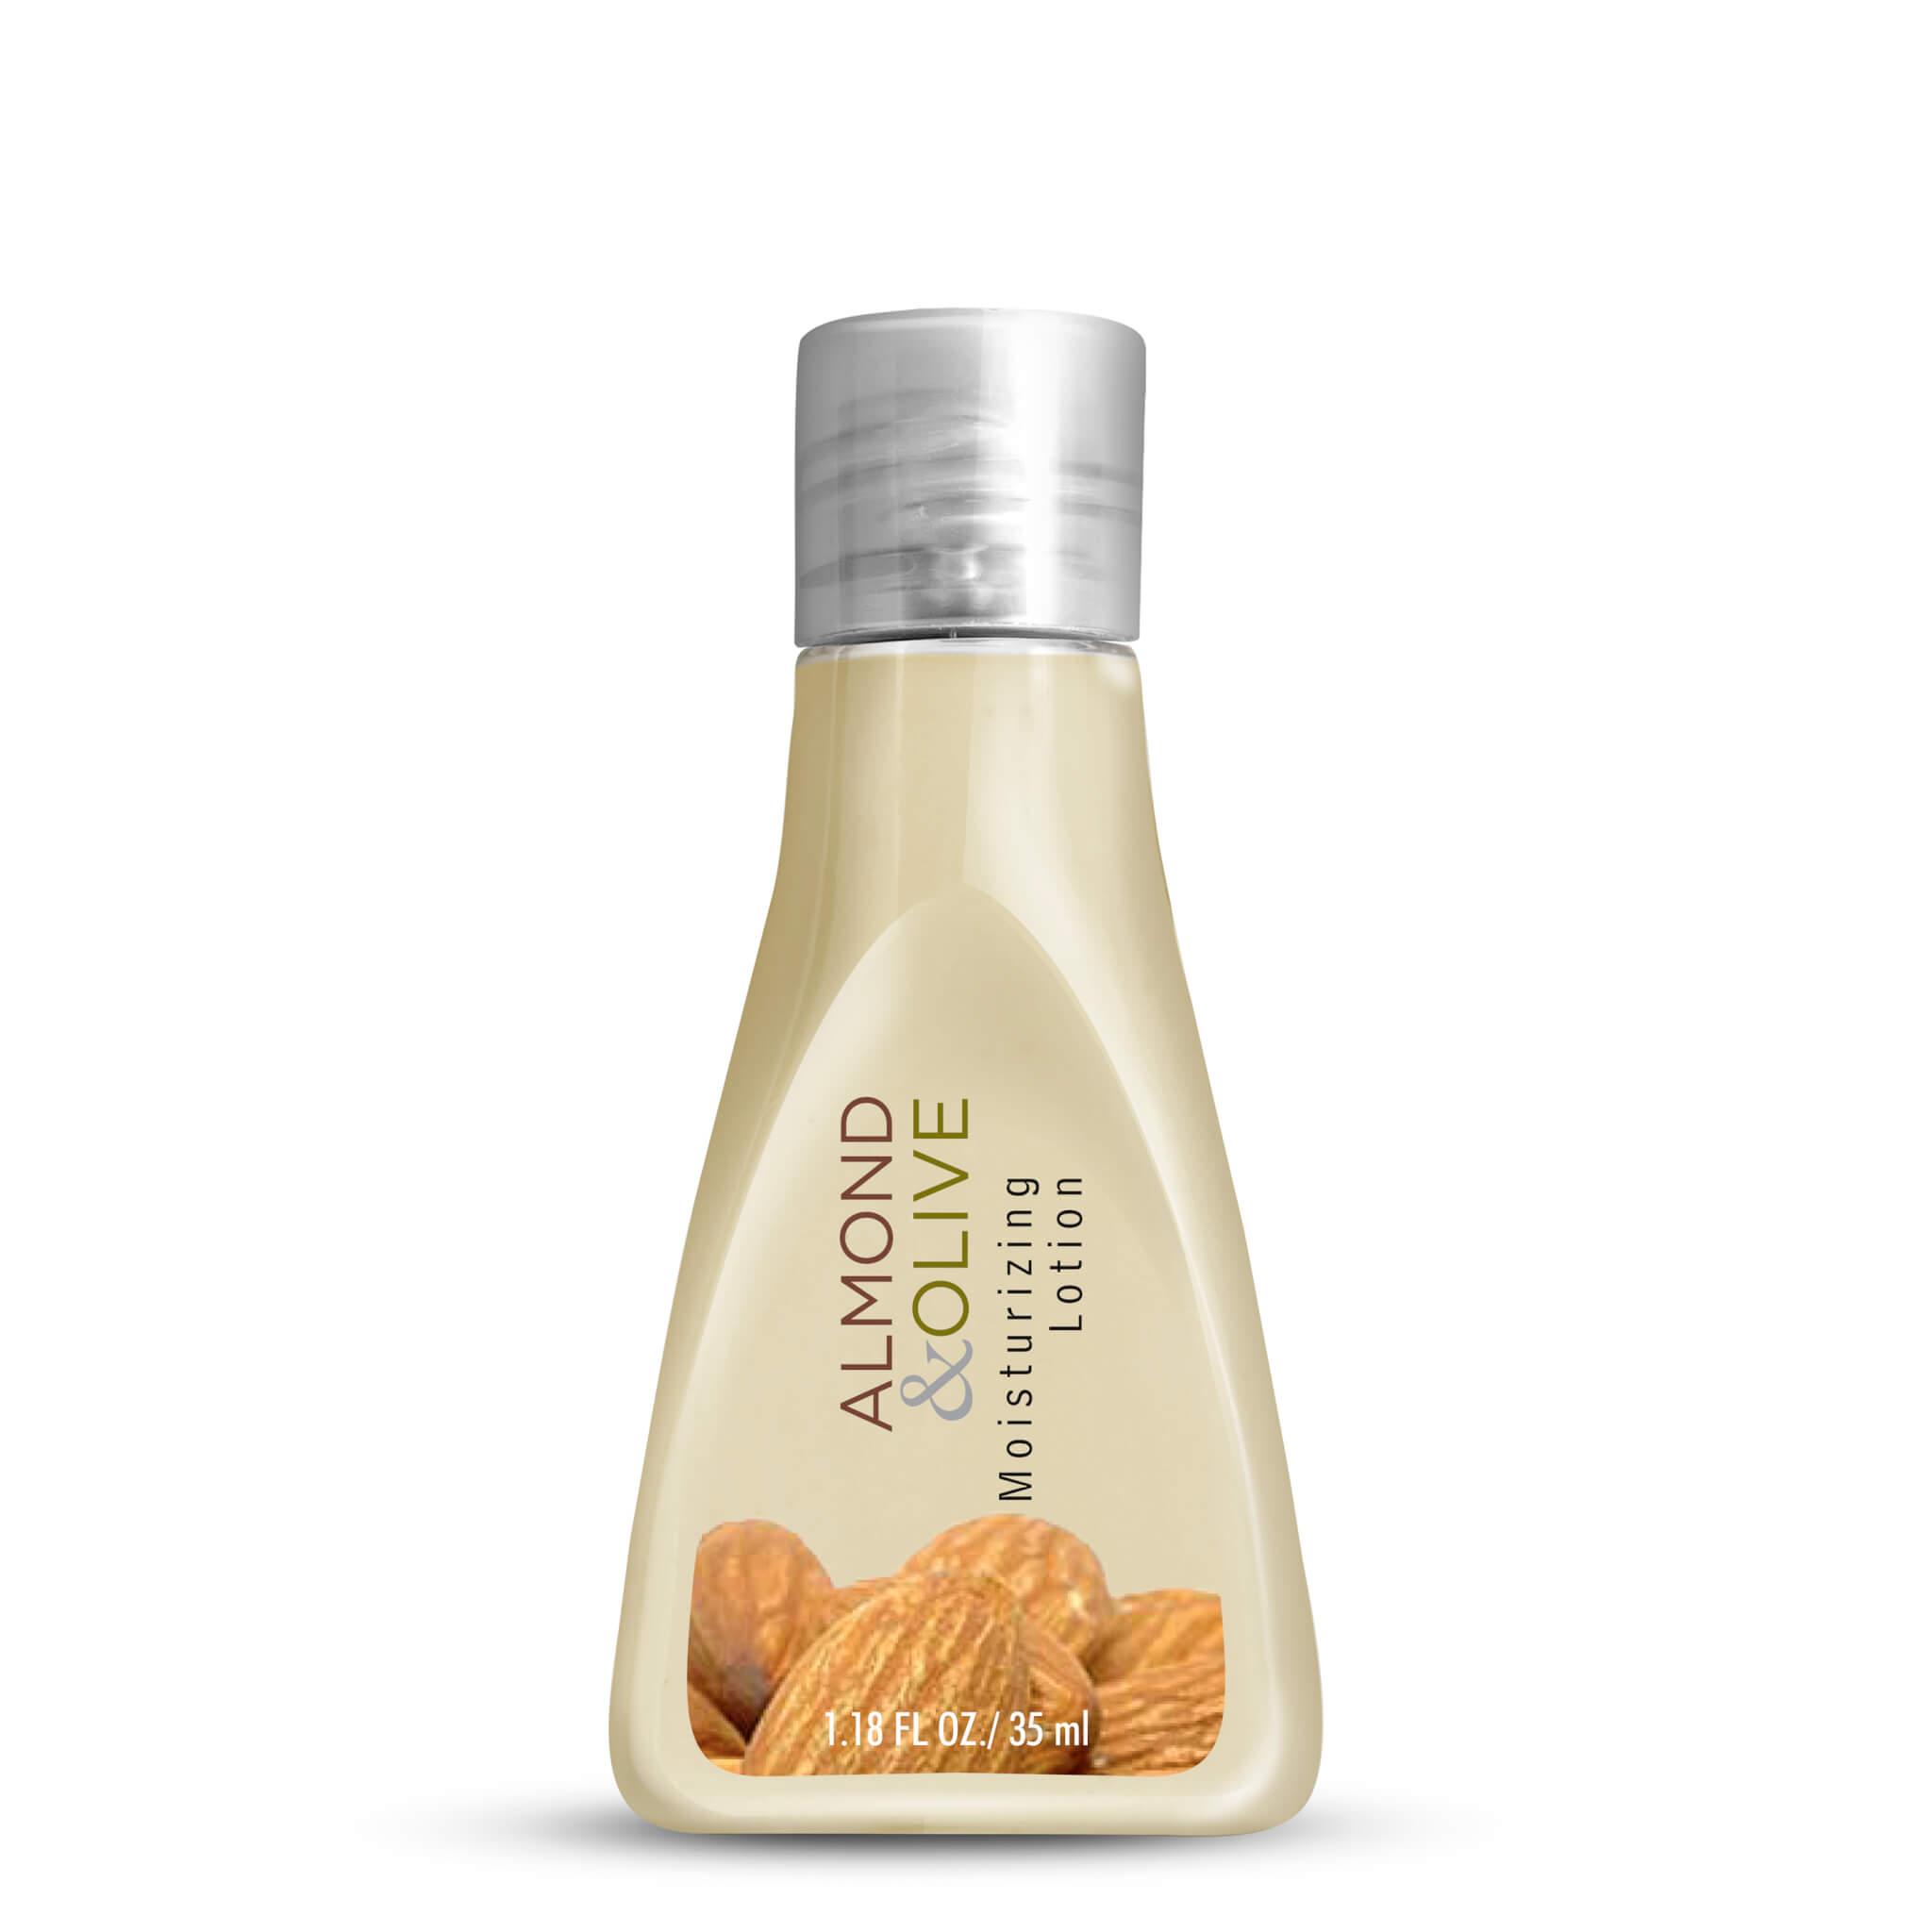 Almond & Olive Moisturizing Lotion | SLX Hospitality Almond Olie